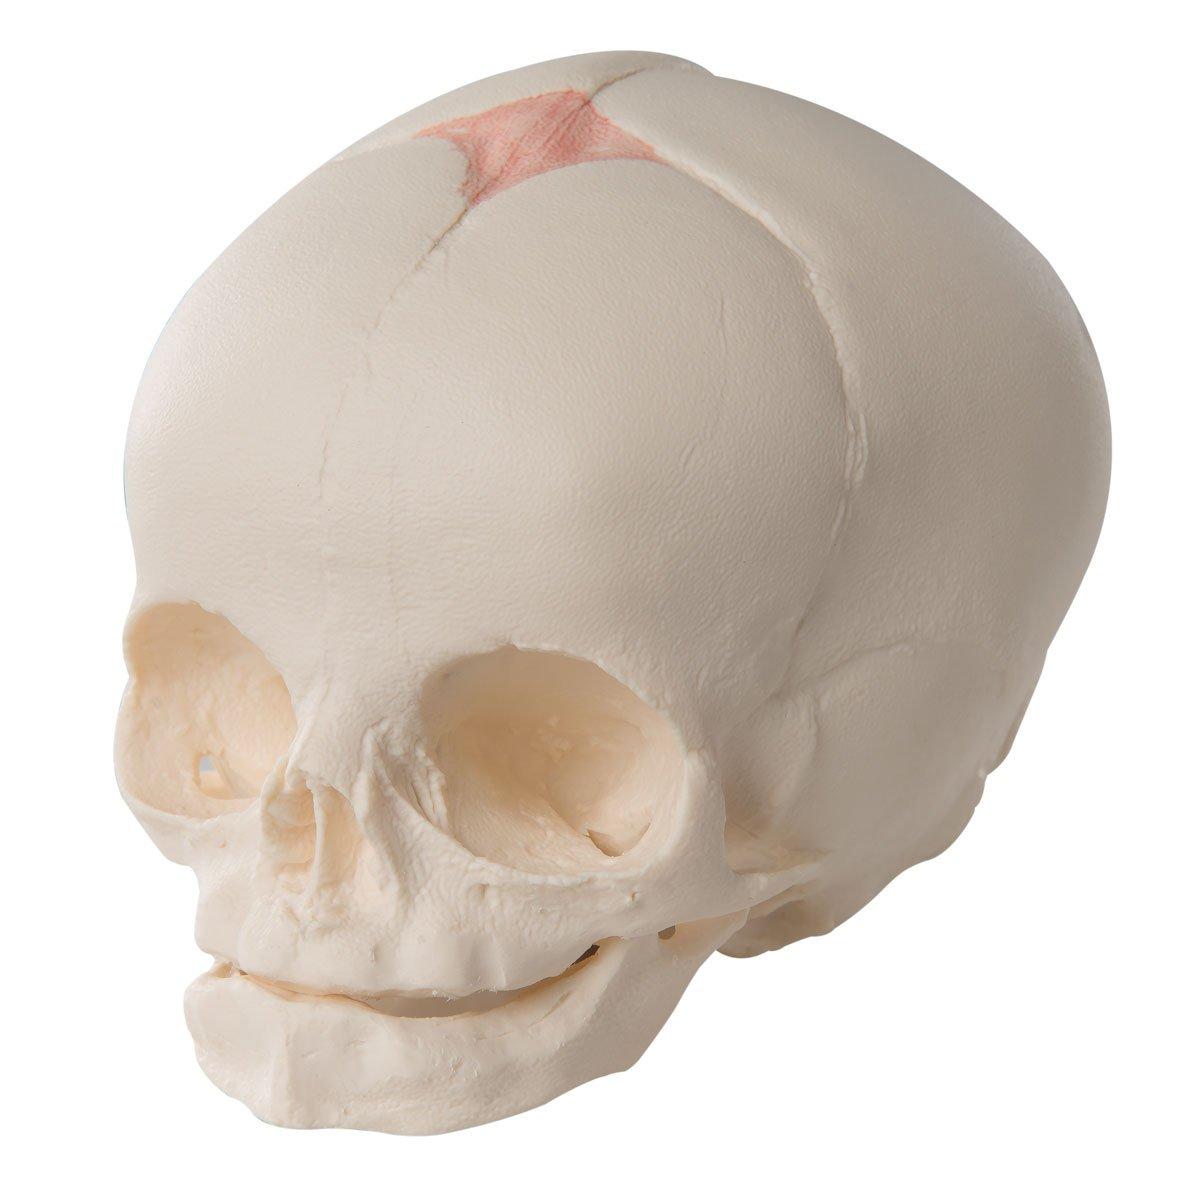 3B Scientific Human Anatomy - Fetal Skull Model: Amazon.co.uk ...